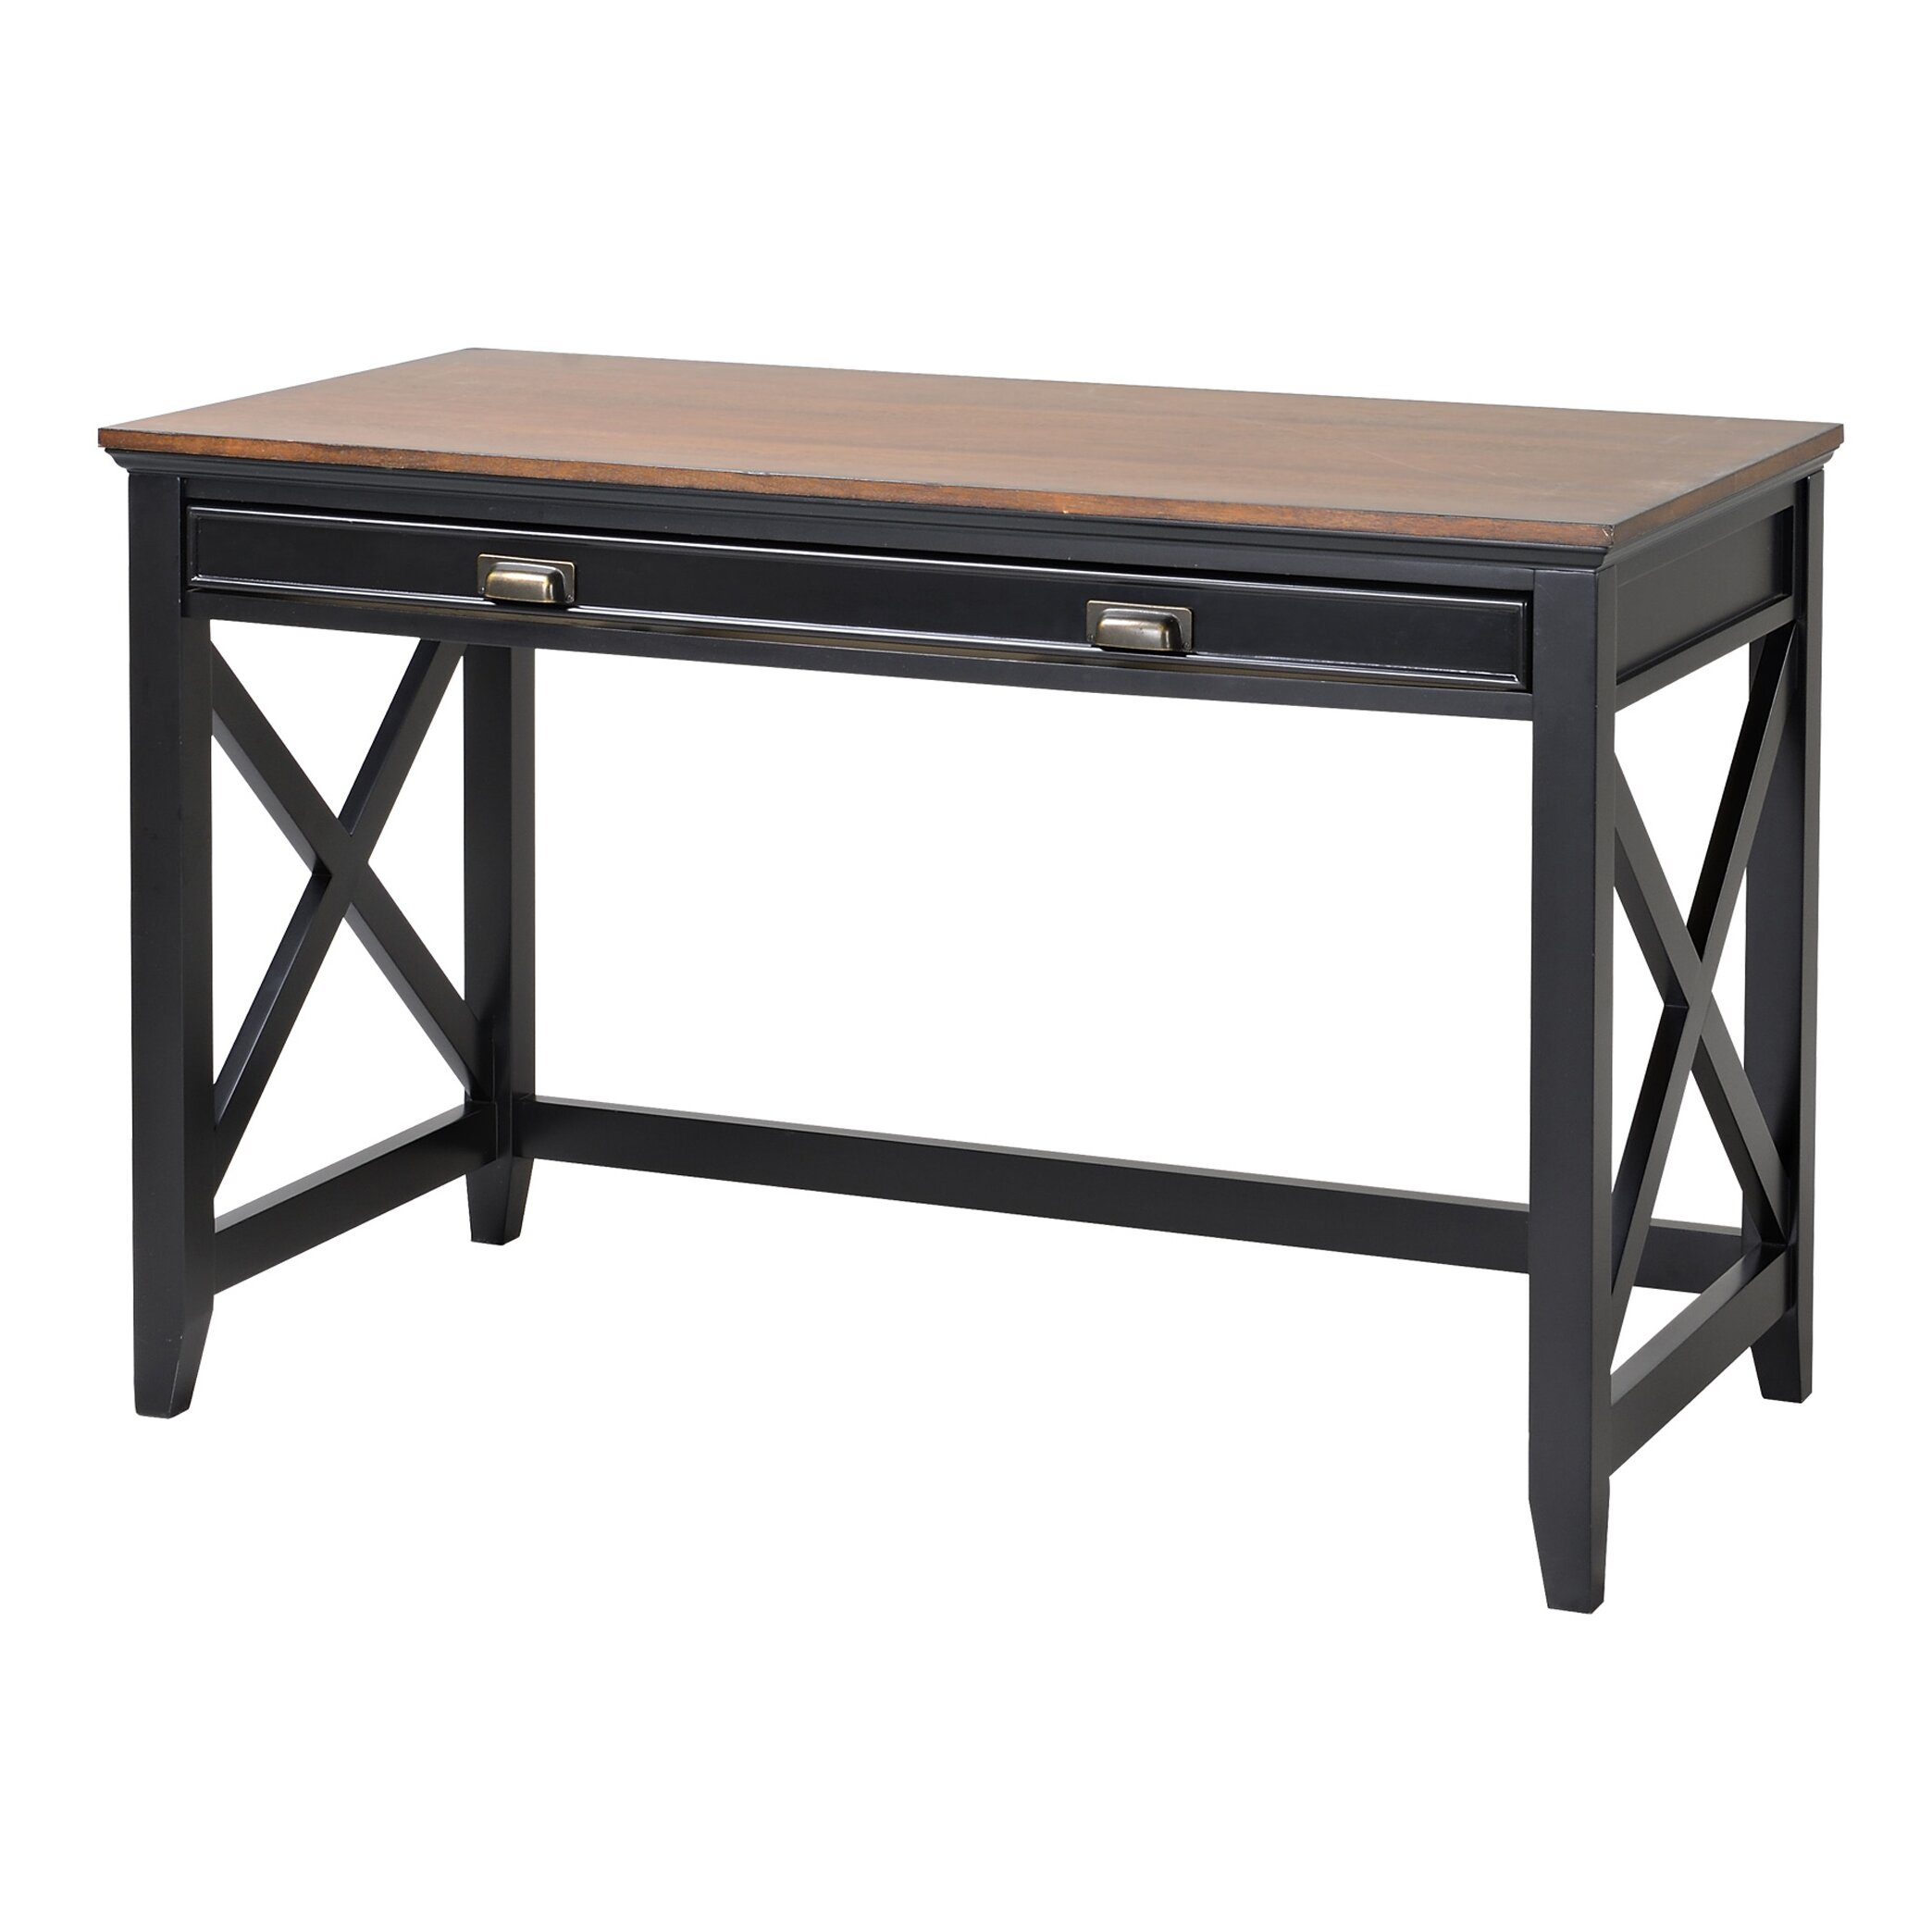 homestar writing desk with 1 drawer reviews. Black Bedroom Furniture Sets. Home Design Ideas